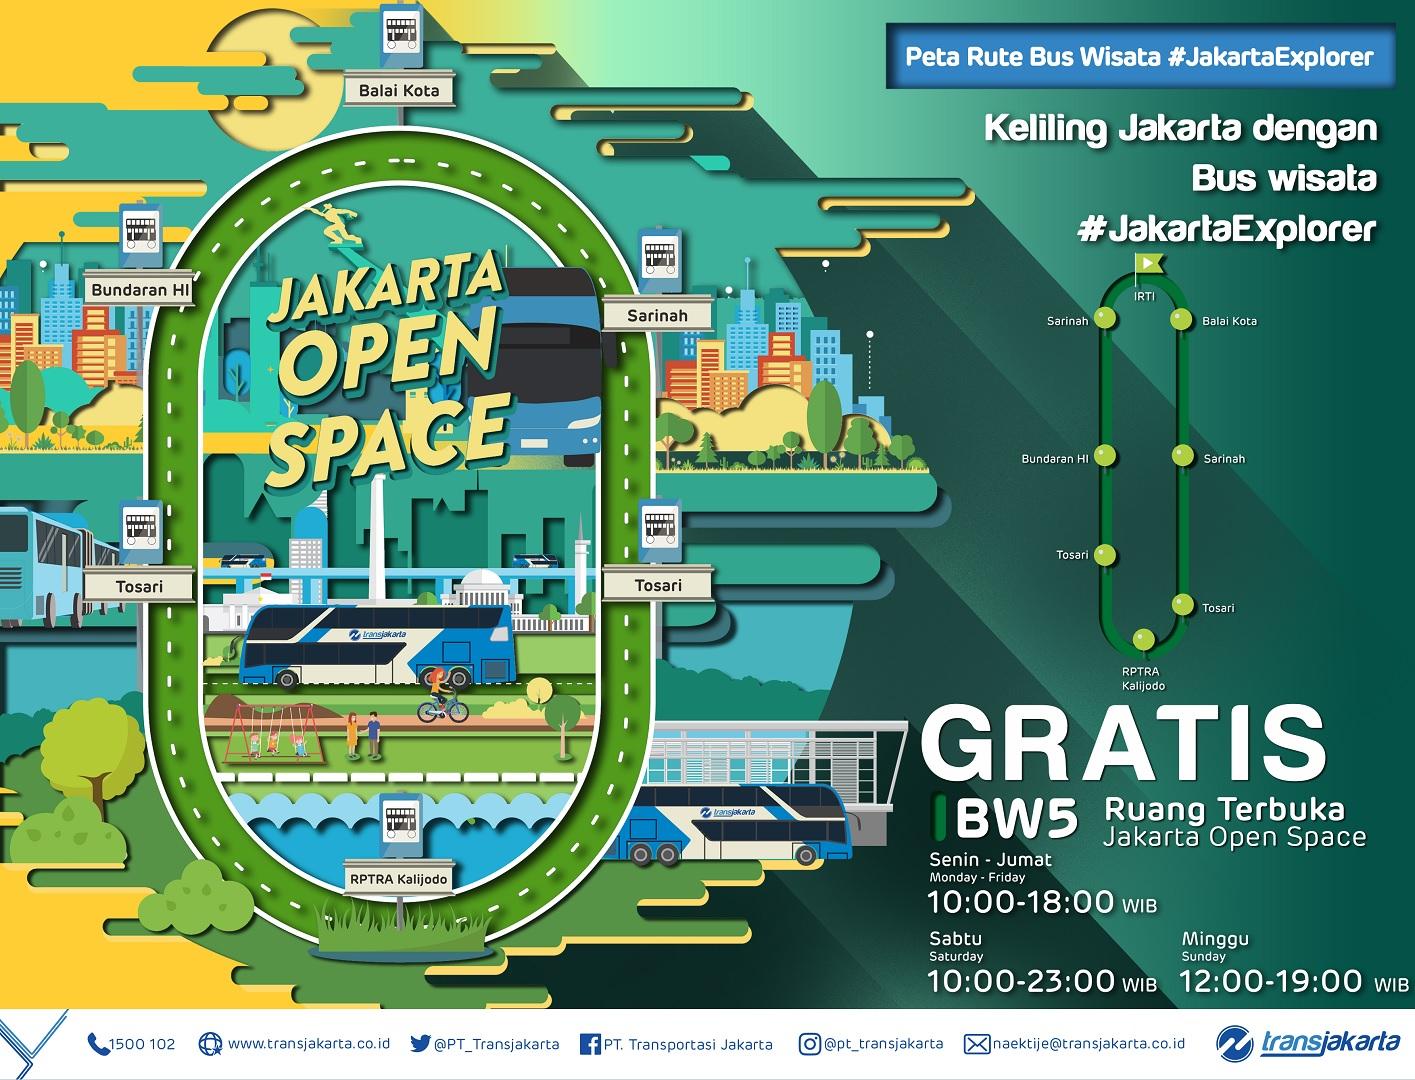 Jadwal Bus Wisata Transjakarta DKI Jakarta Gratis Terbaru